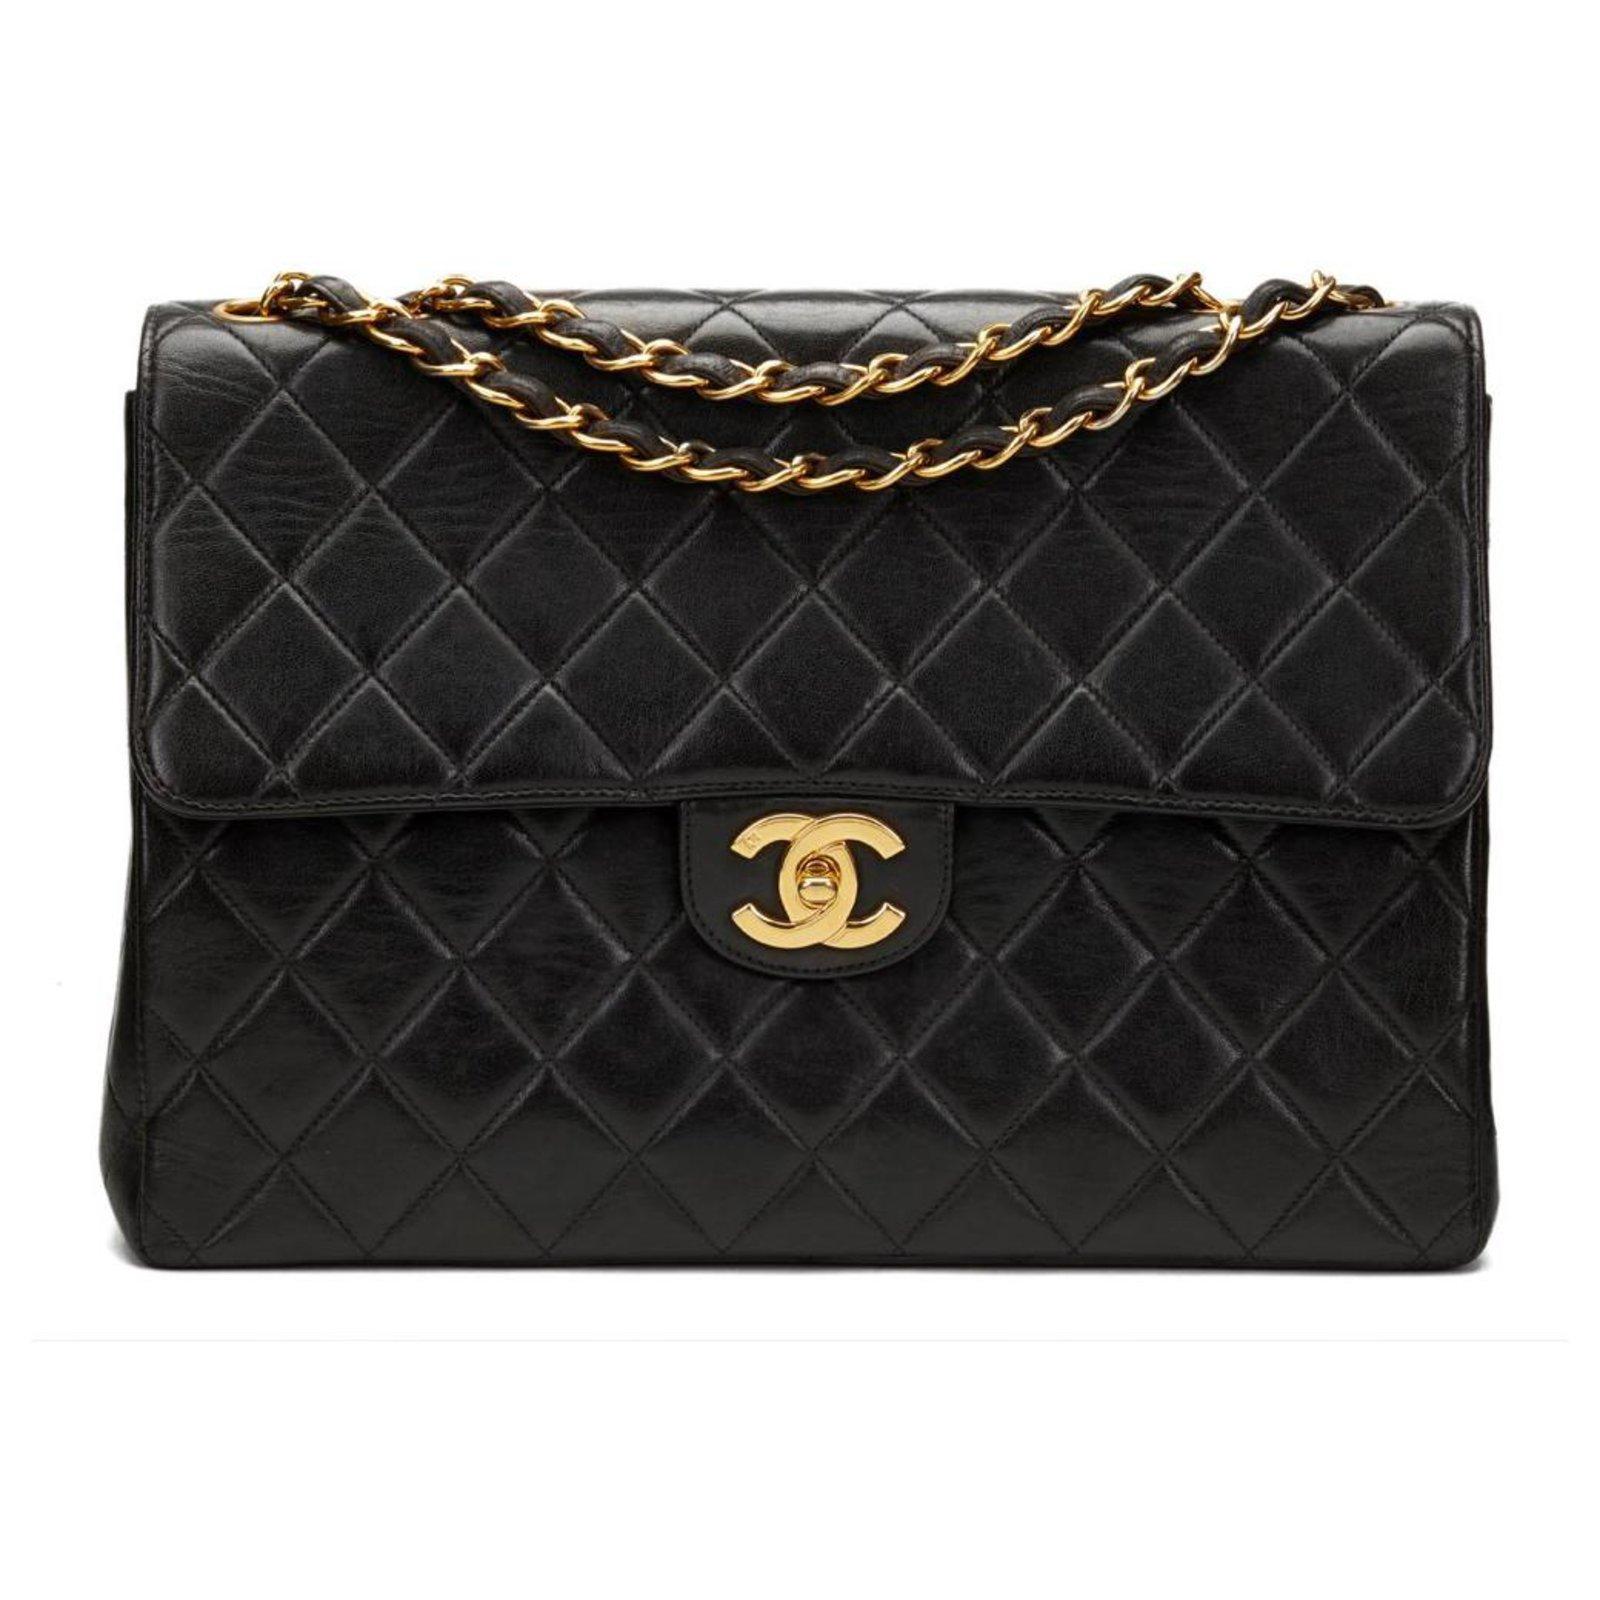 5467208ff2e5 Chanel Classic jumbo single flap Handbags Lambskin Black ref.124136 ...